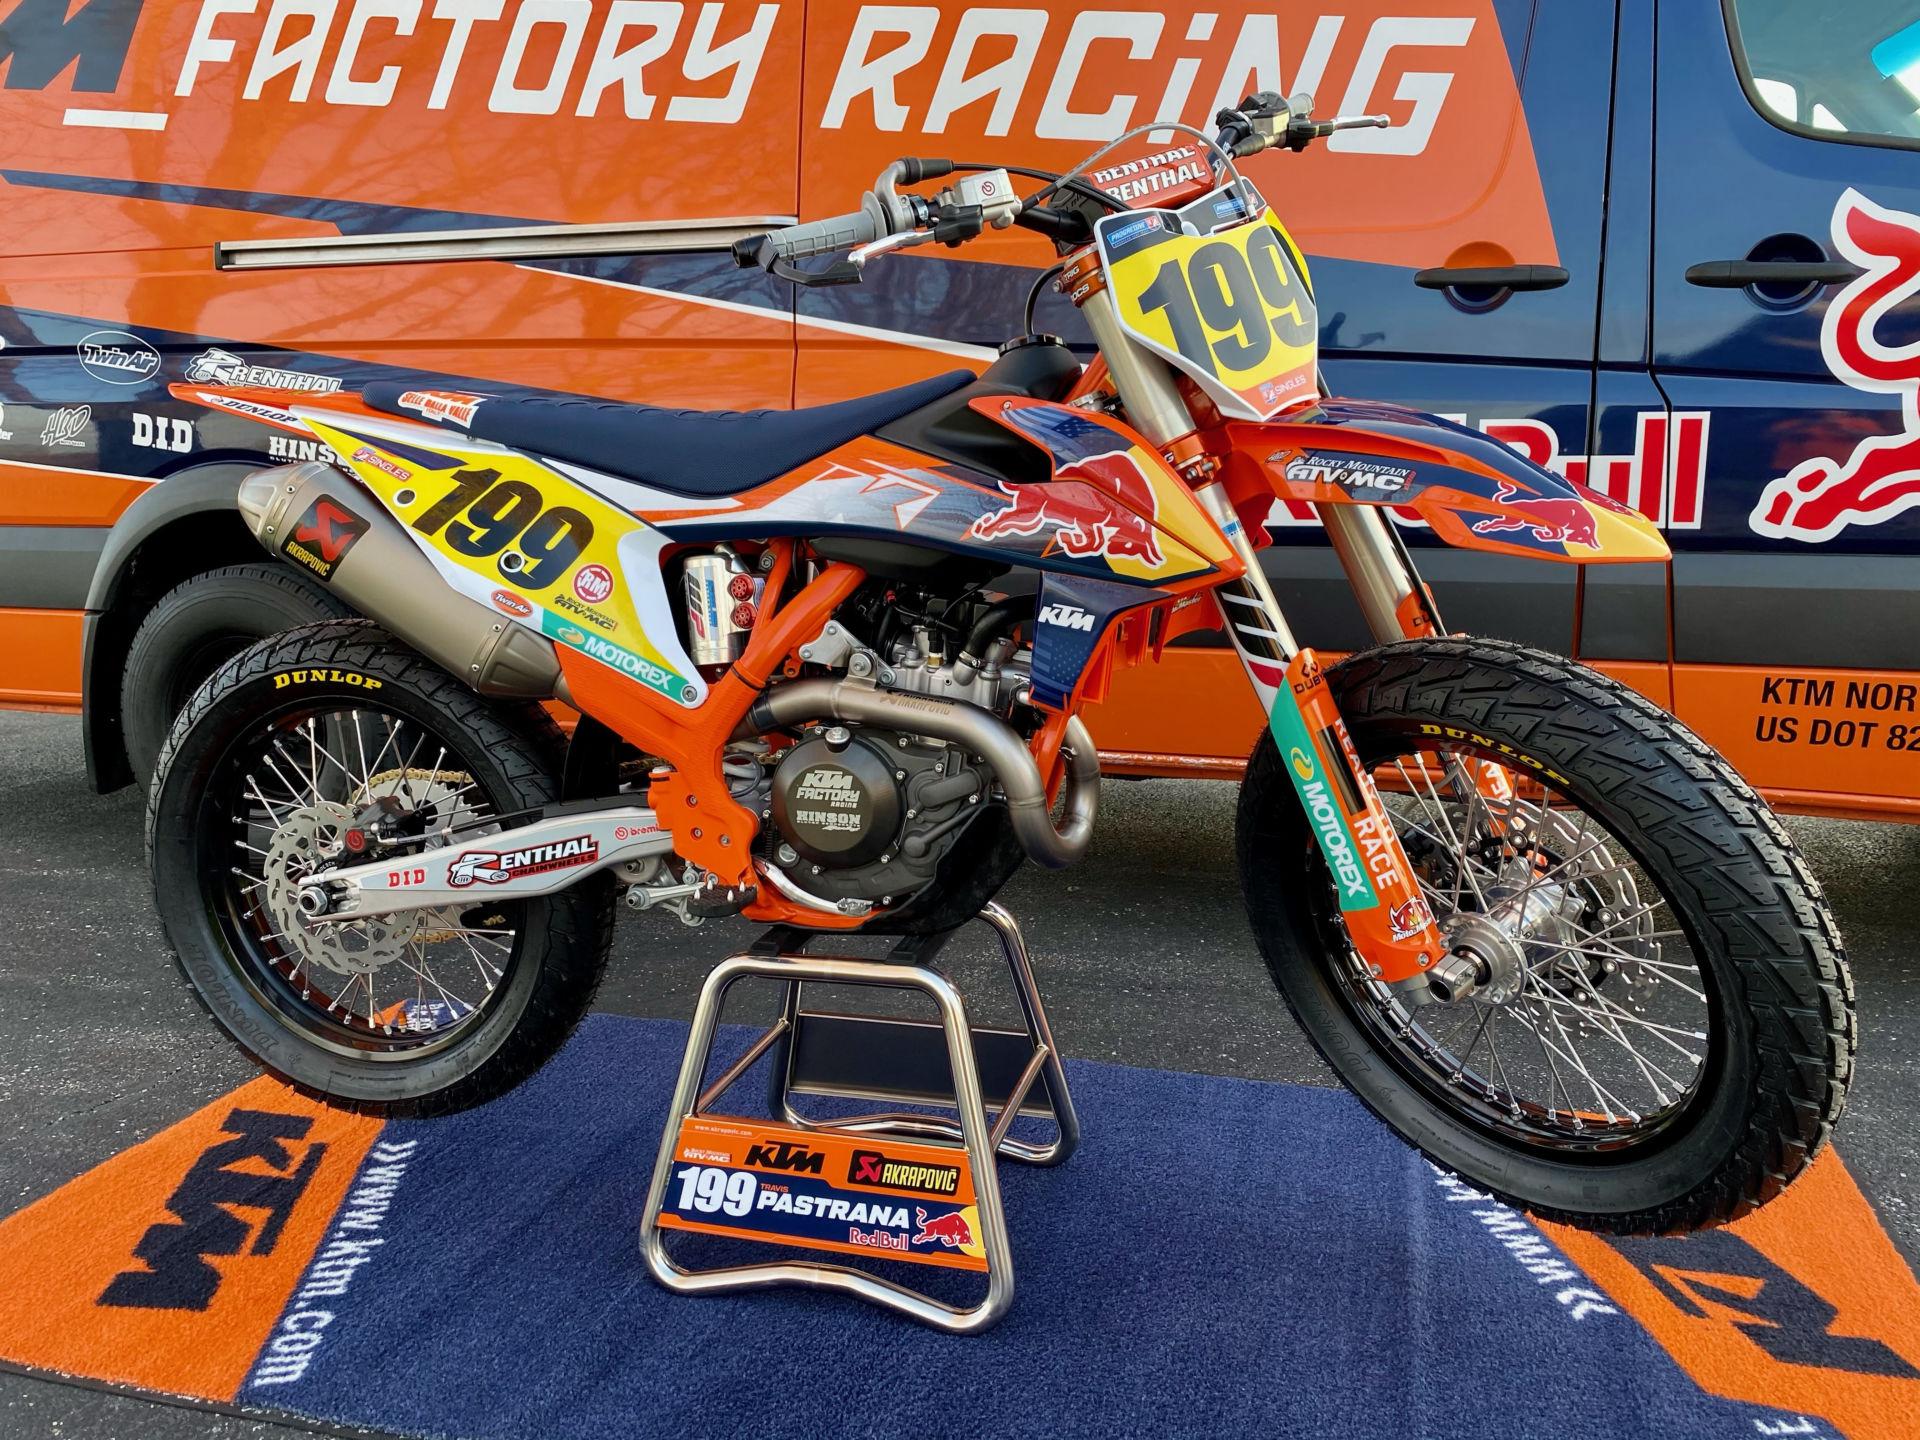 Travis Pastrana's Red Bull KTM dirt tracker. Photo courtesy AFT.